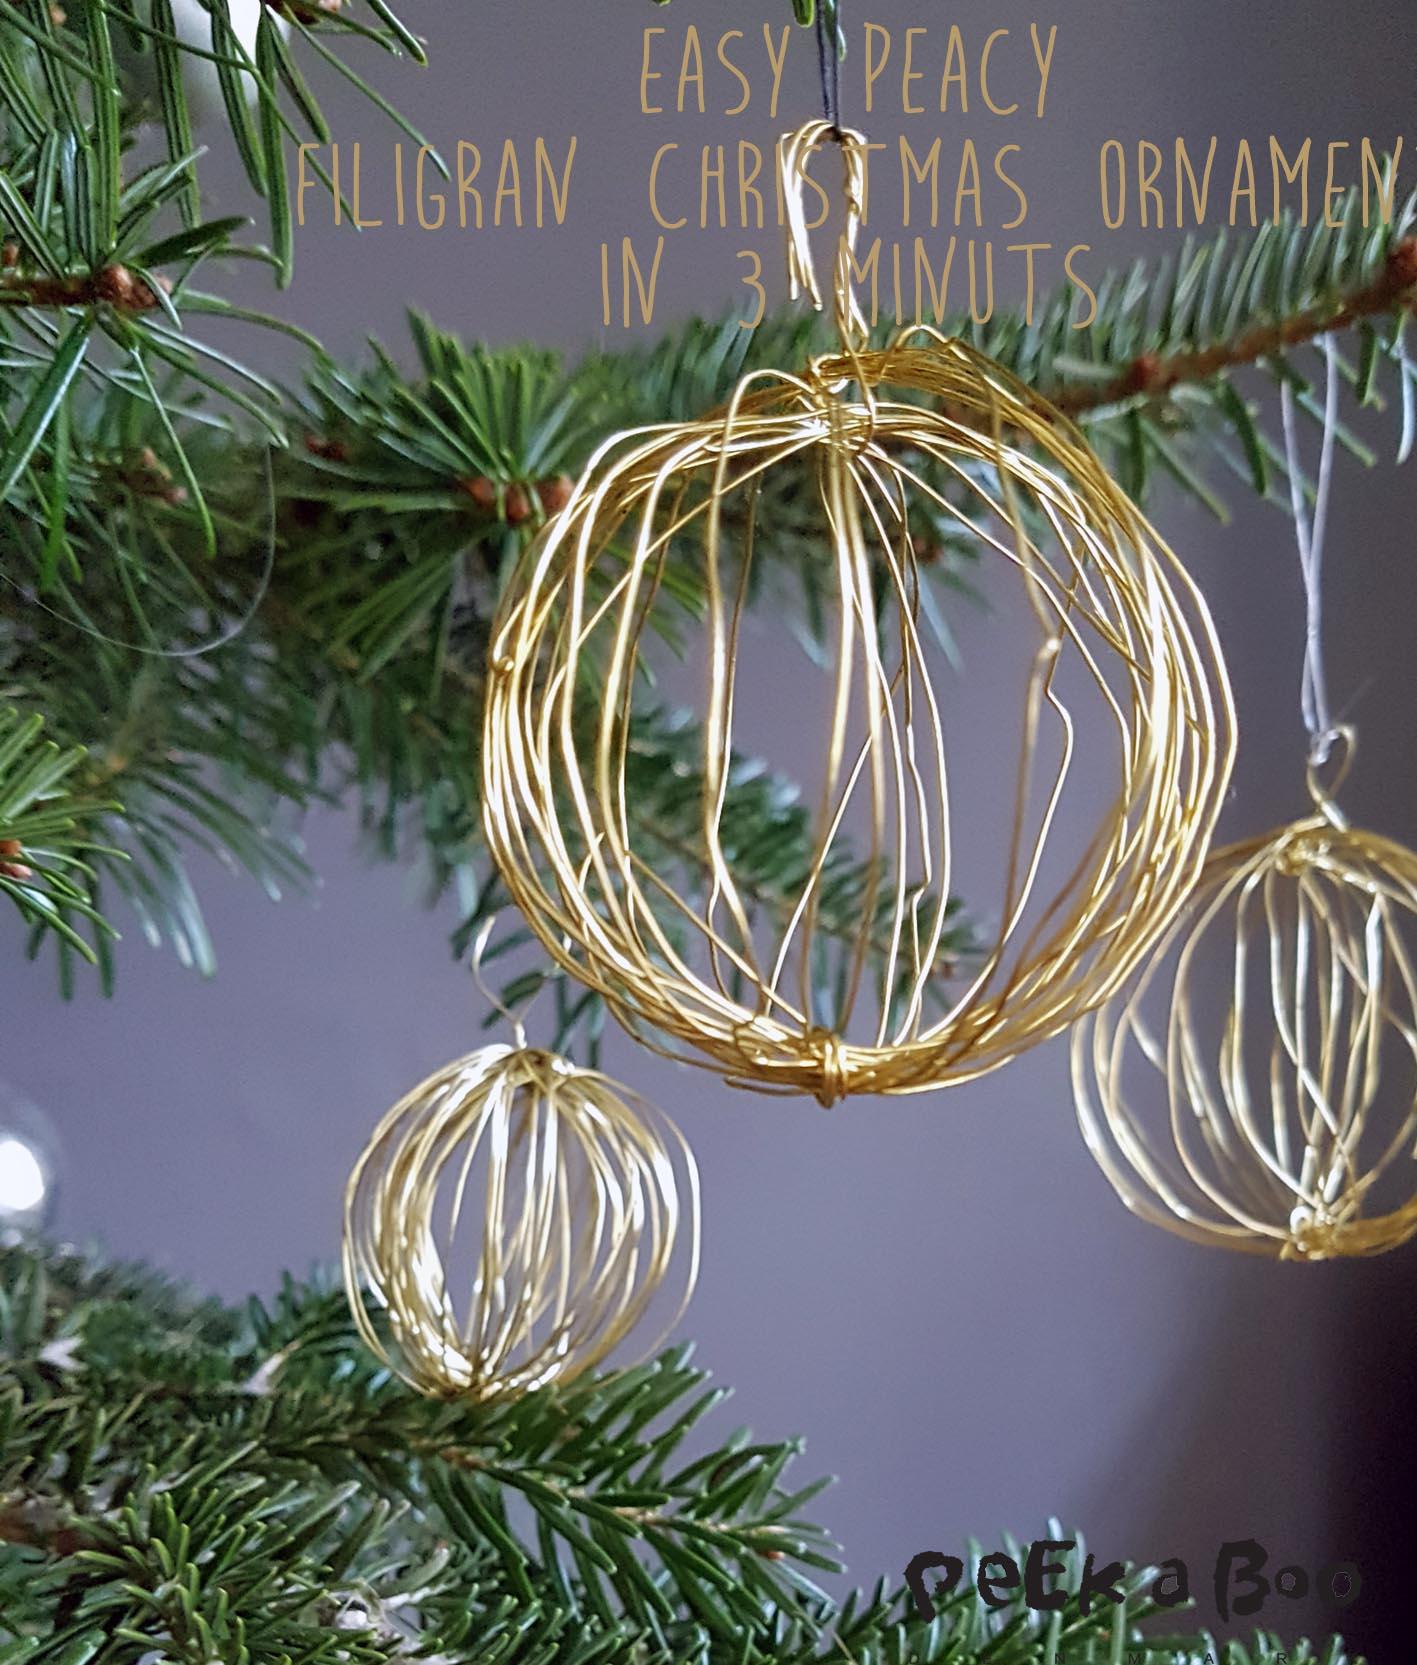 Easy peacy filigran christmas ornament.